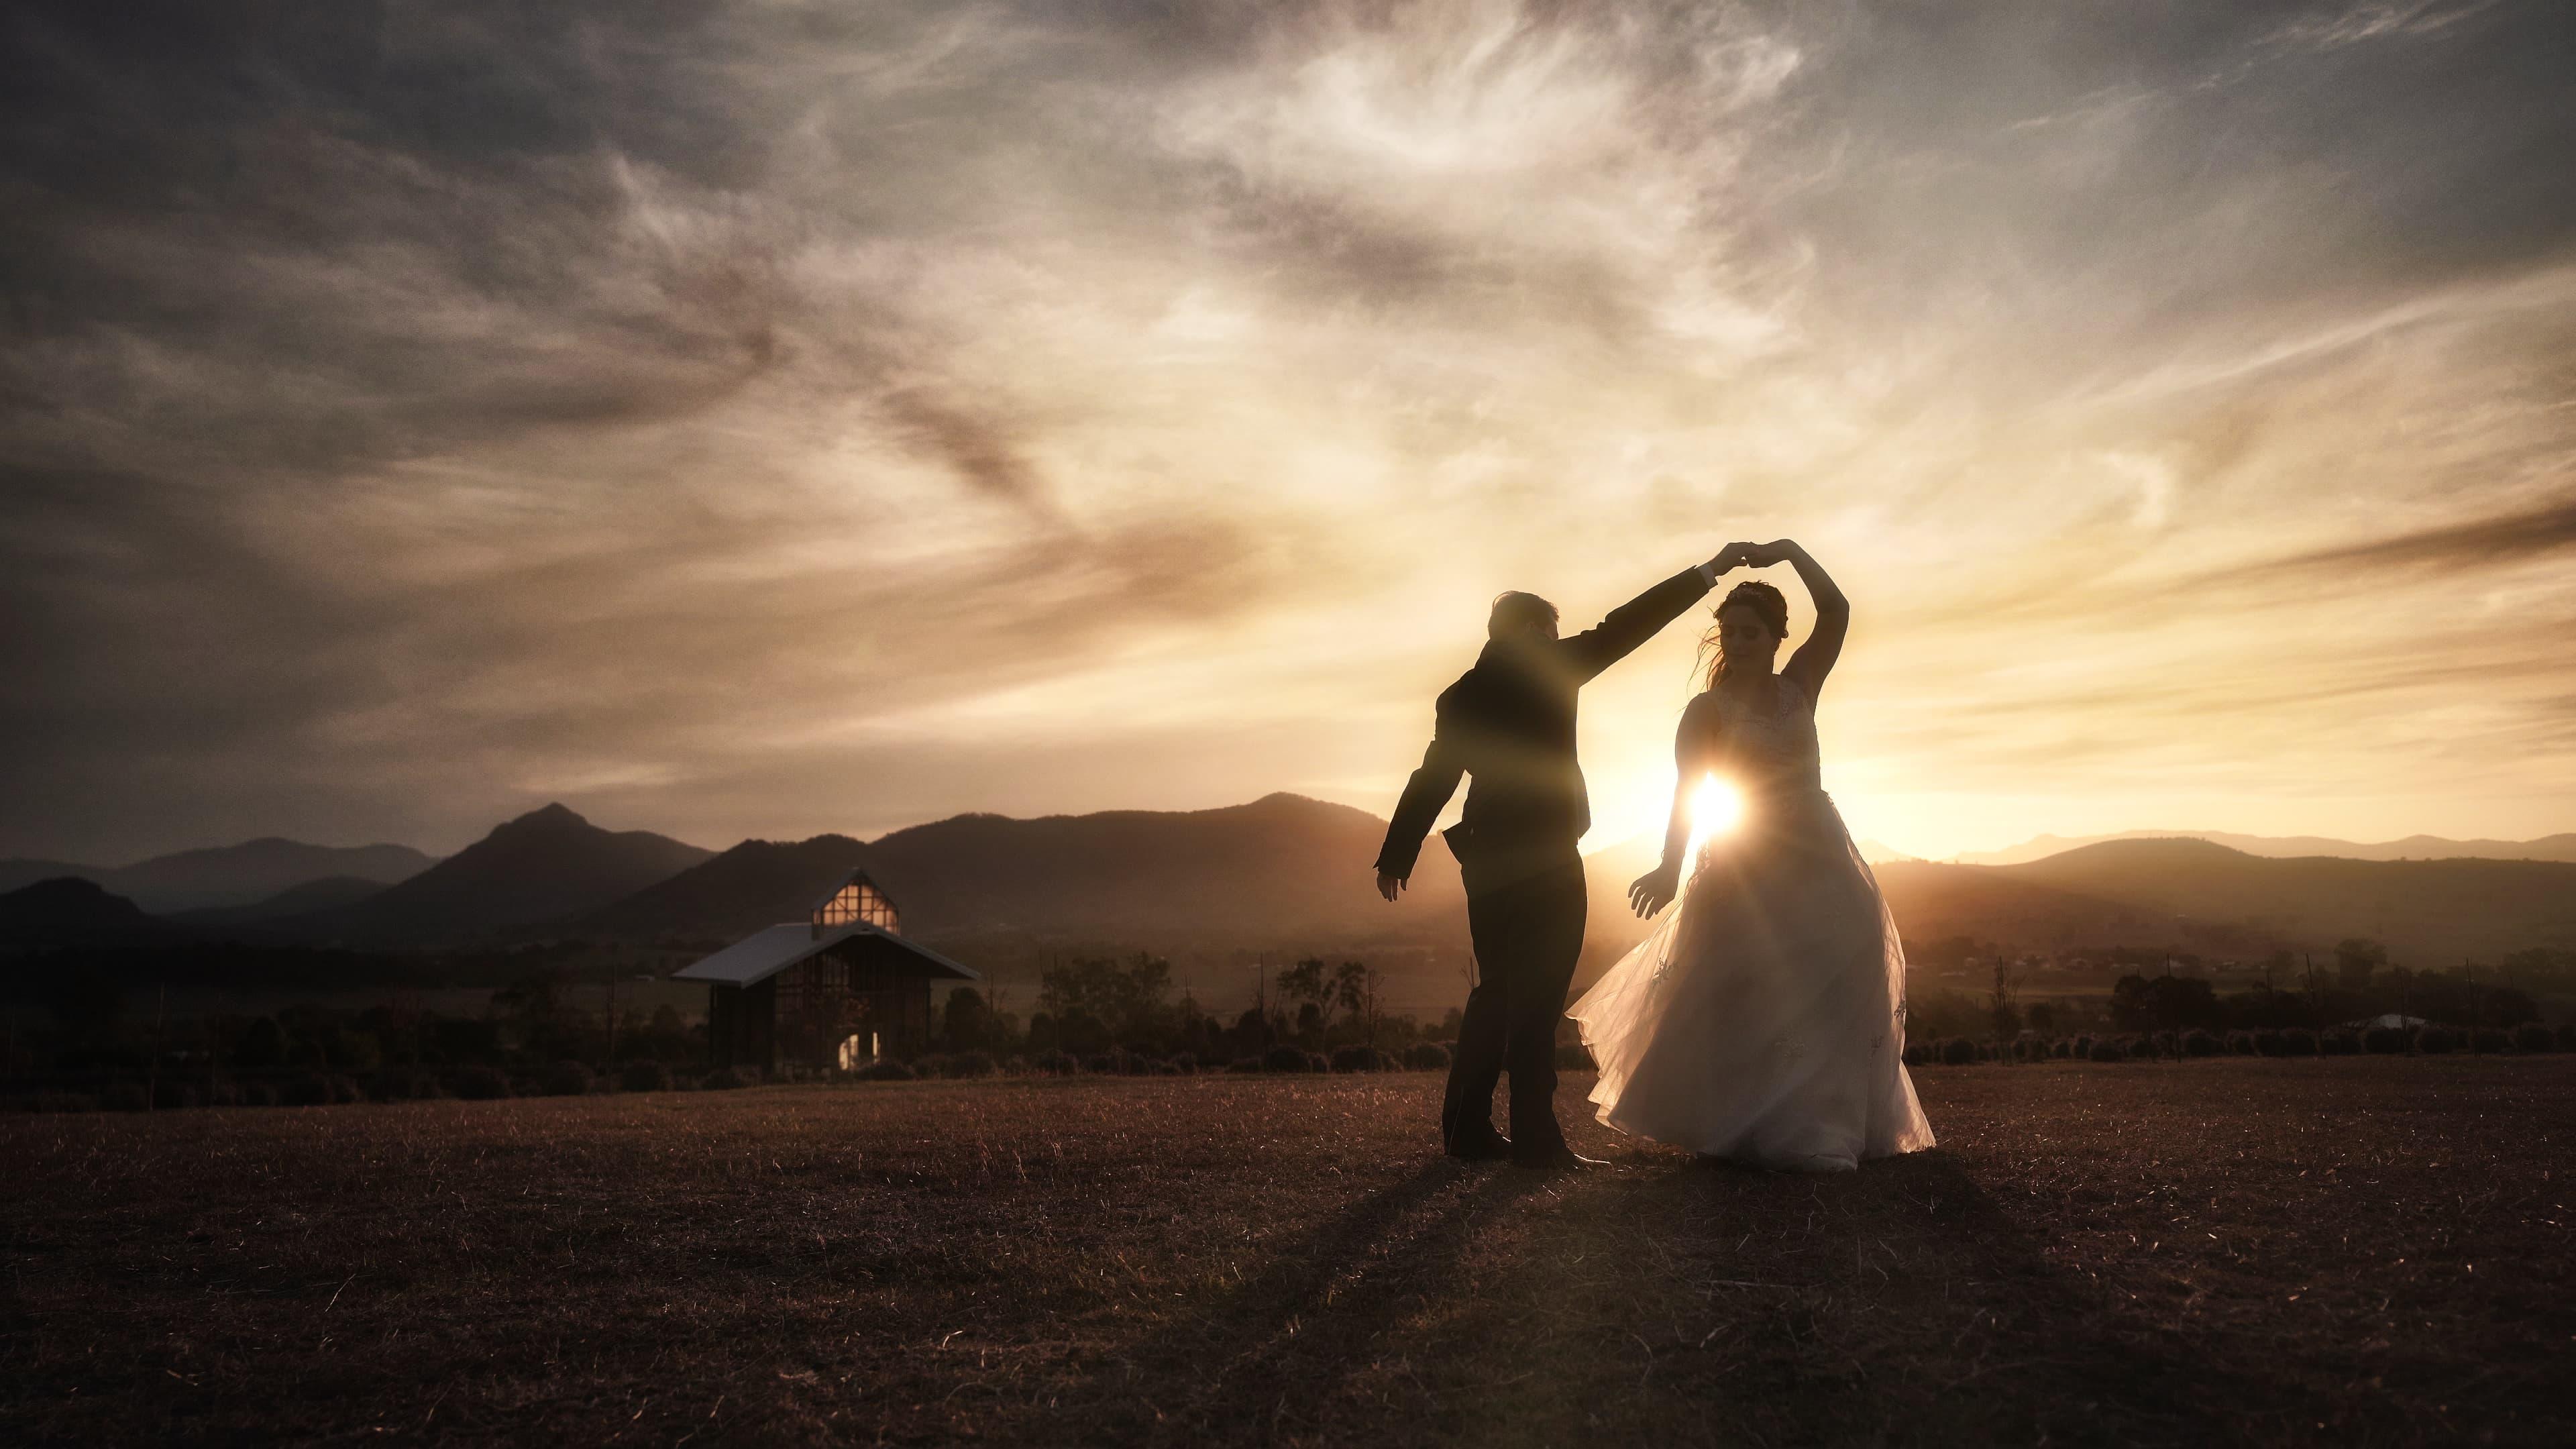 Kooroomba Lavender Farm Wedding Photography and Videography